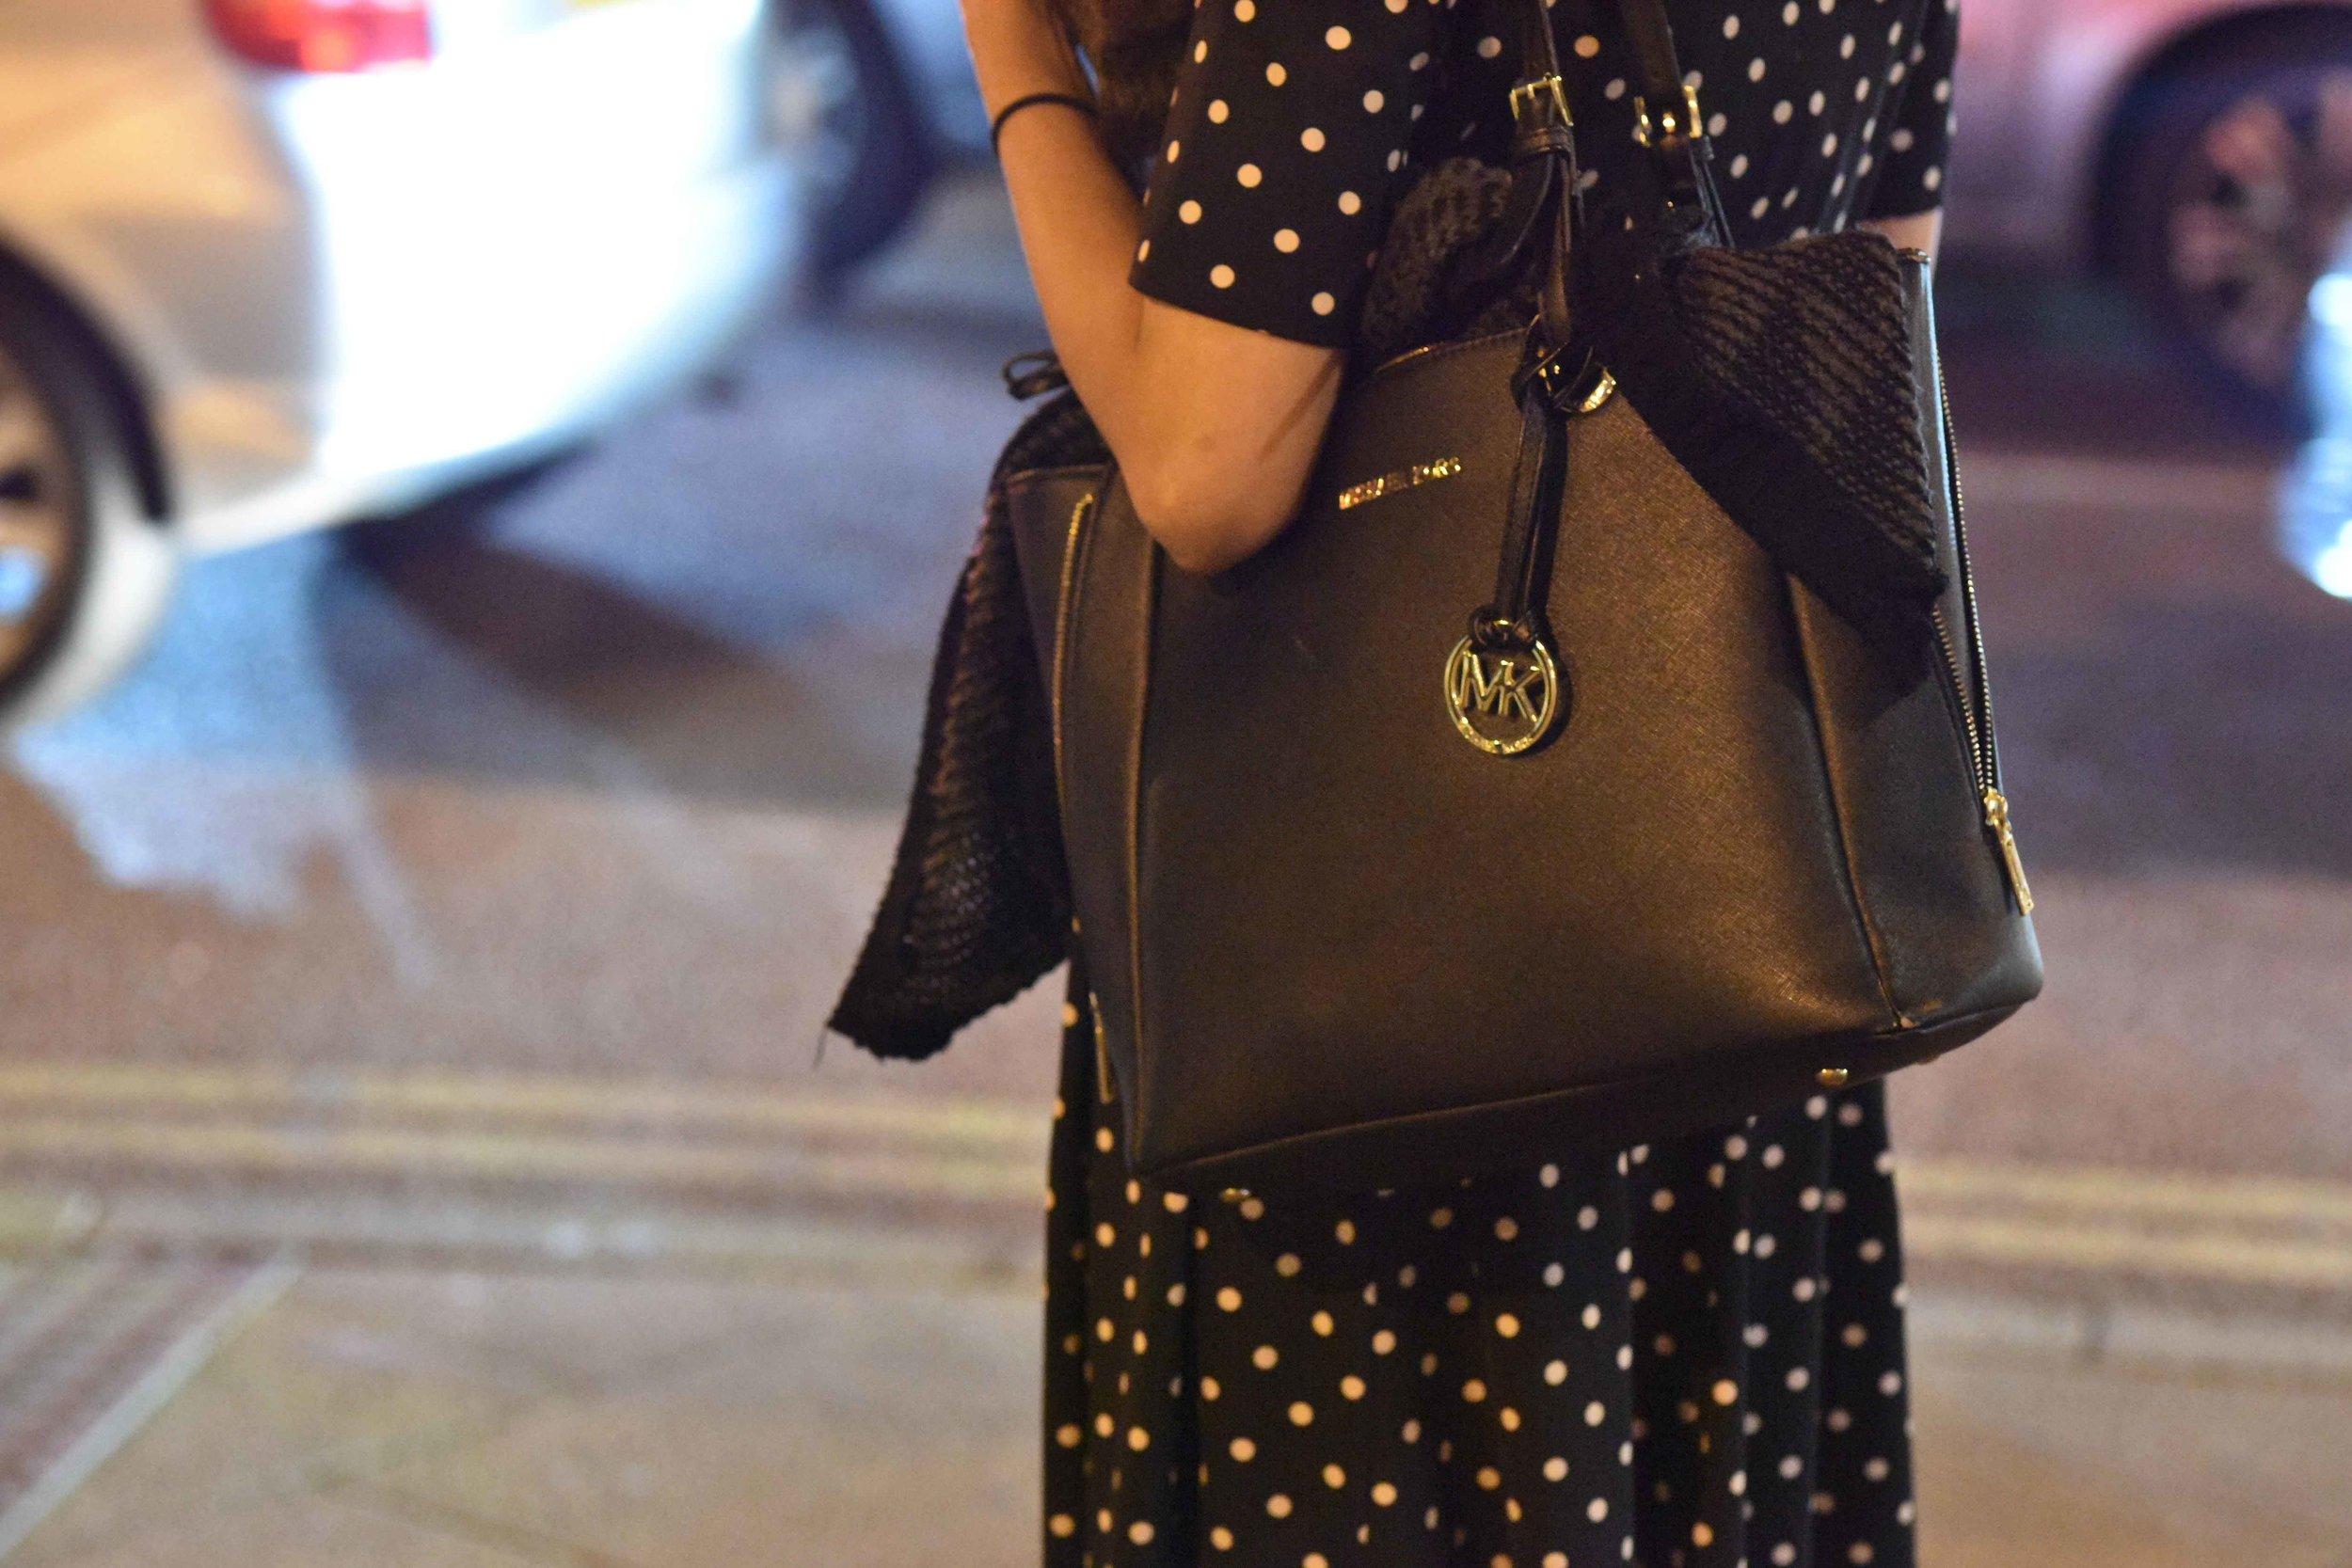 Michael Kors saffiano leather black tote, clicked at Wembley Park underground station, London, U.K. Image©sourcingstyle.com